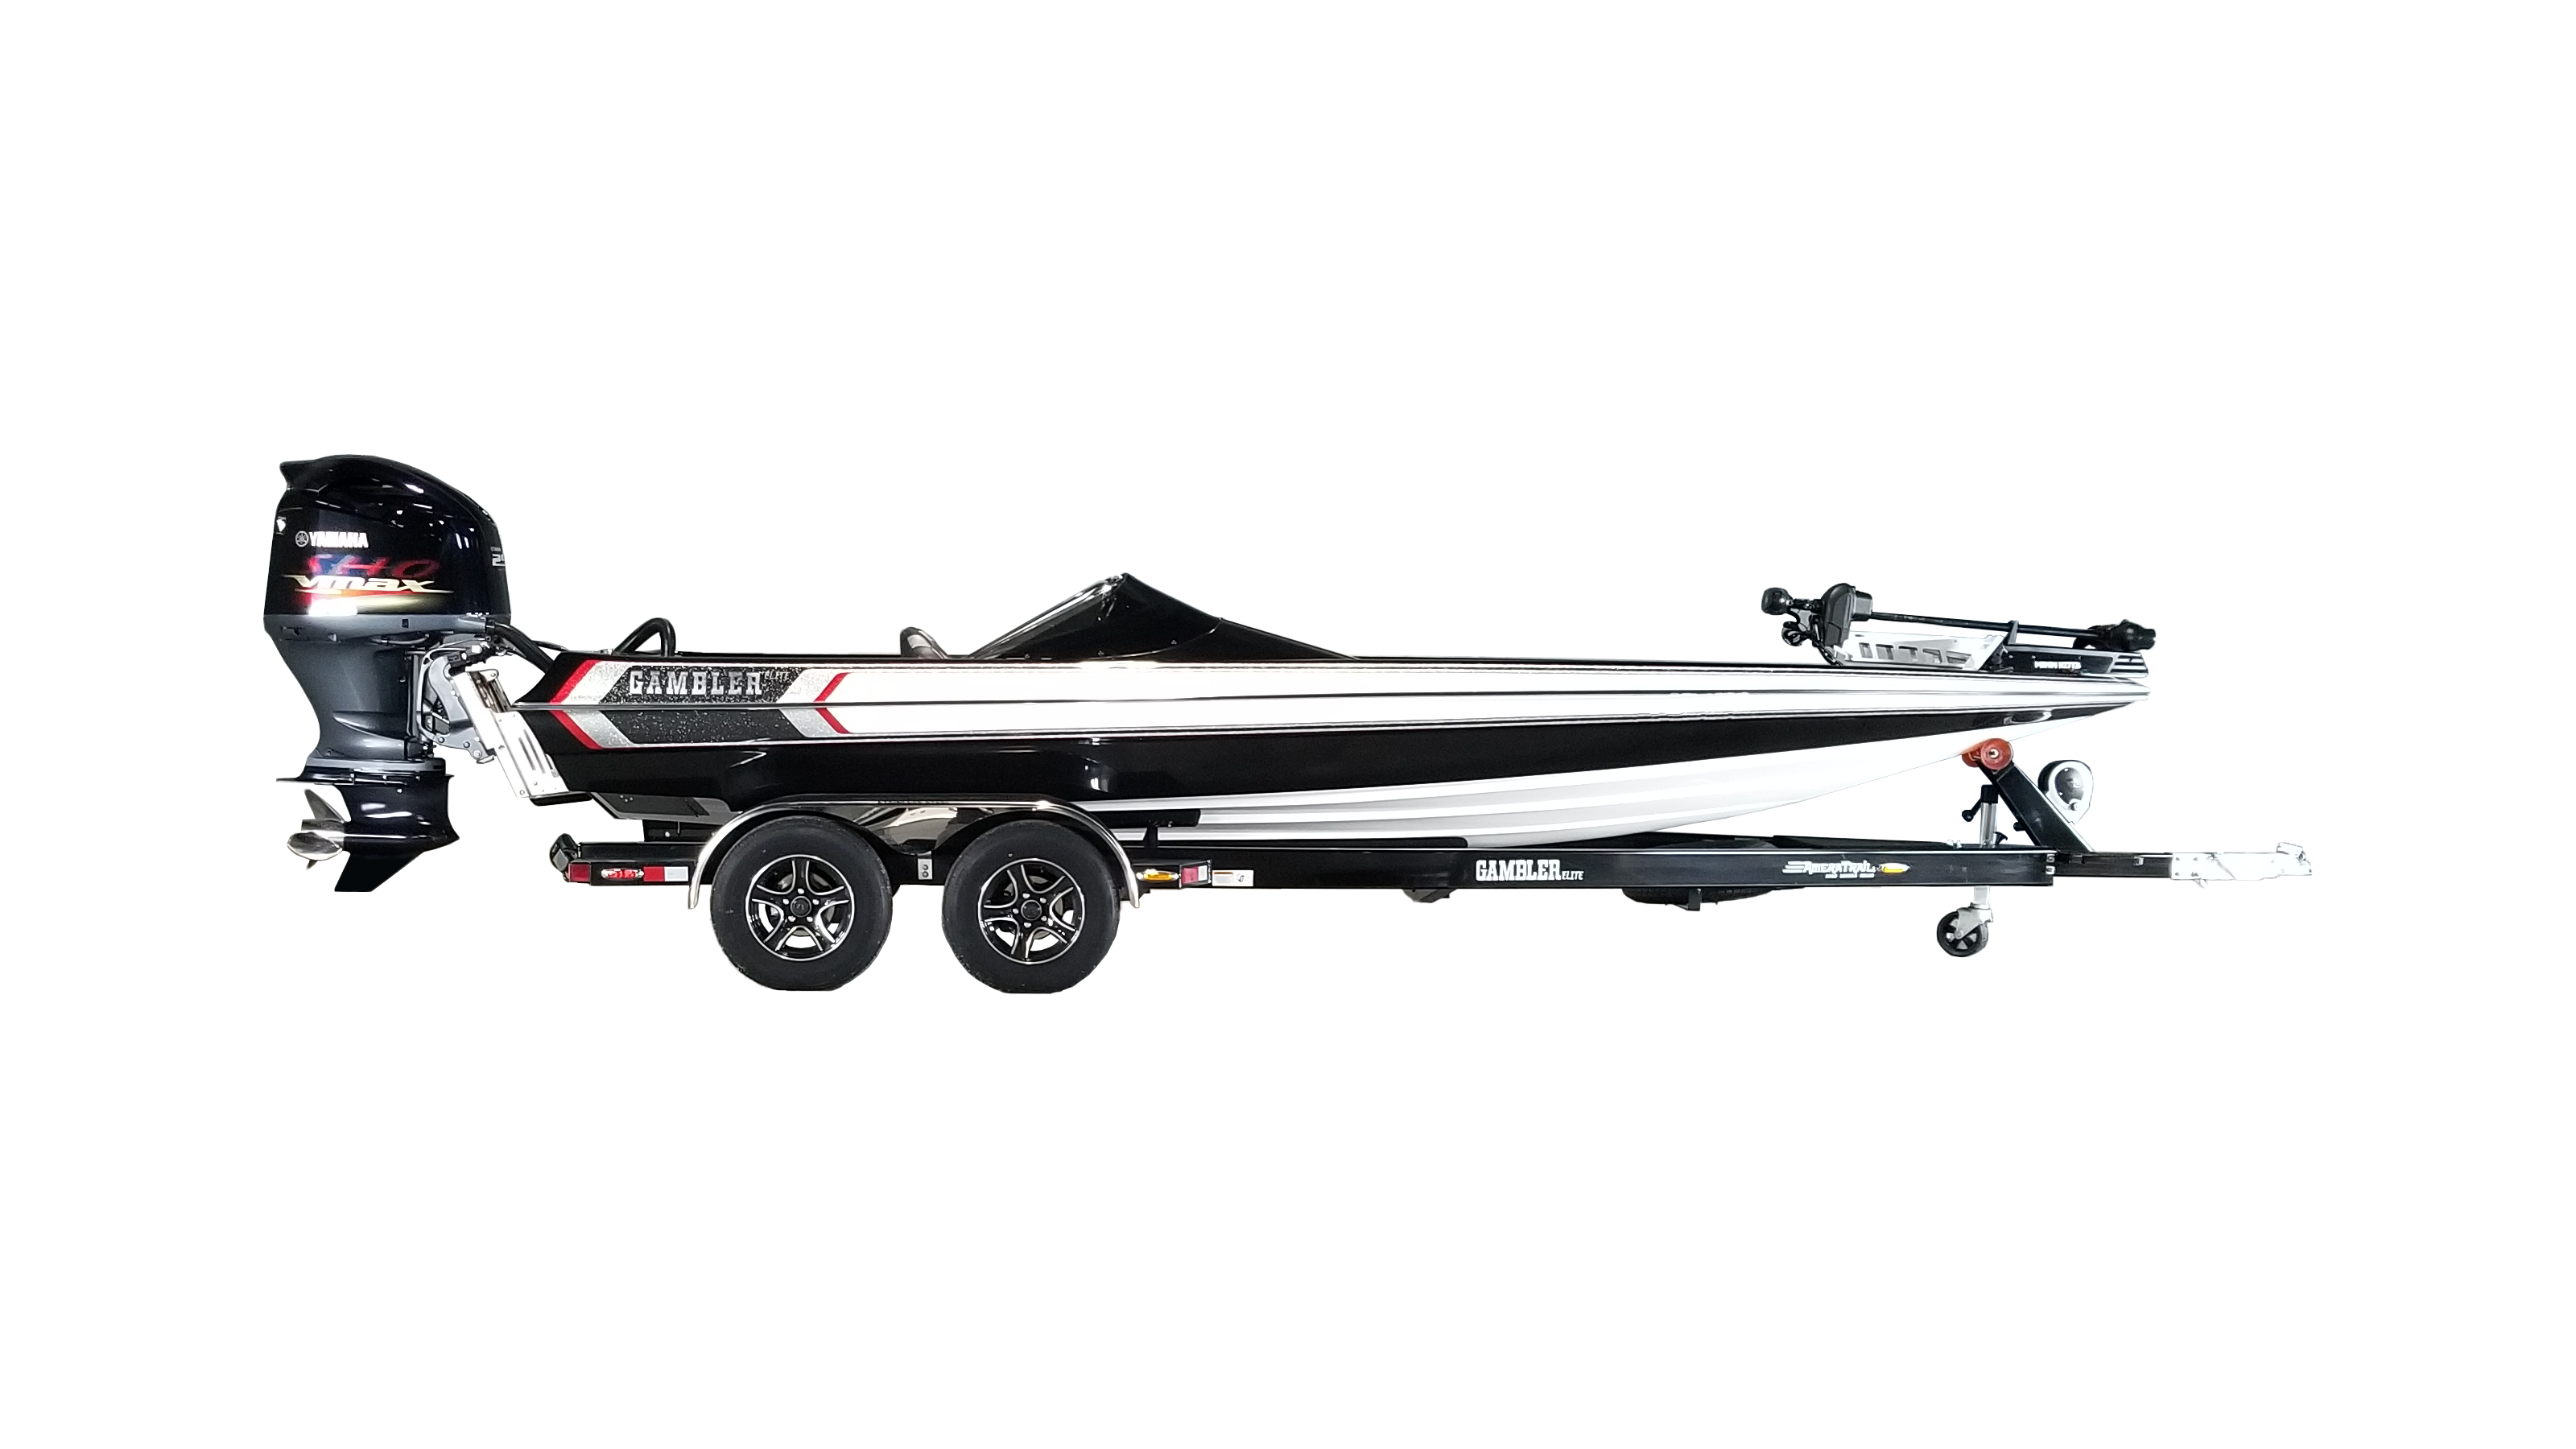 Gambler Elite Gambler Boats Santee Sc 803 854 0000